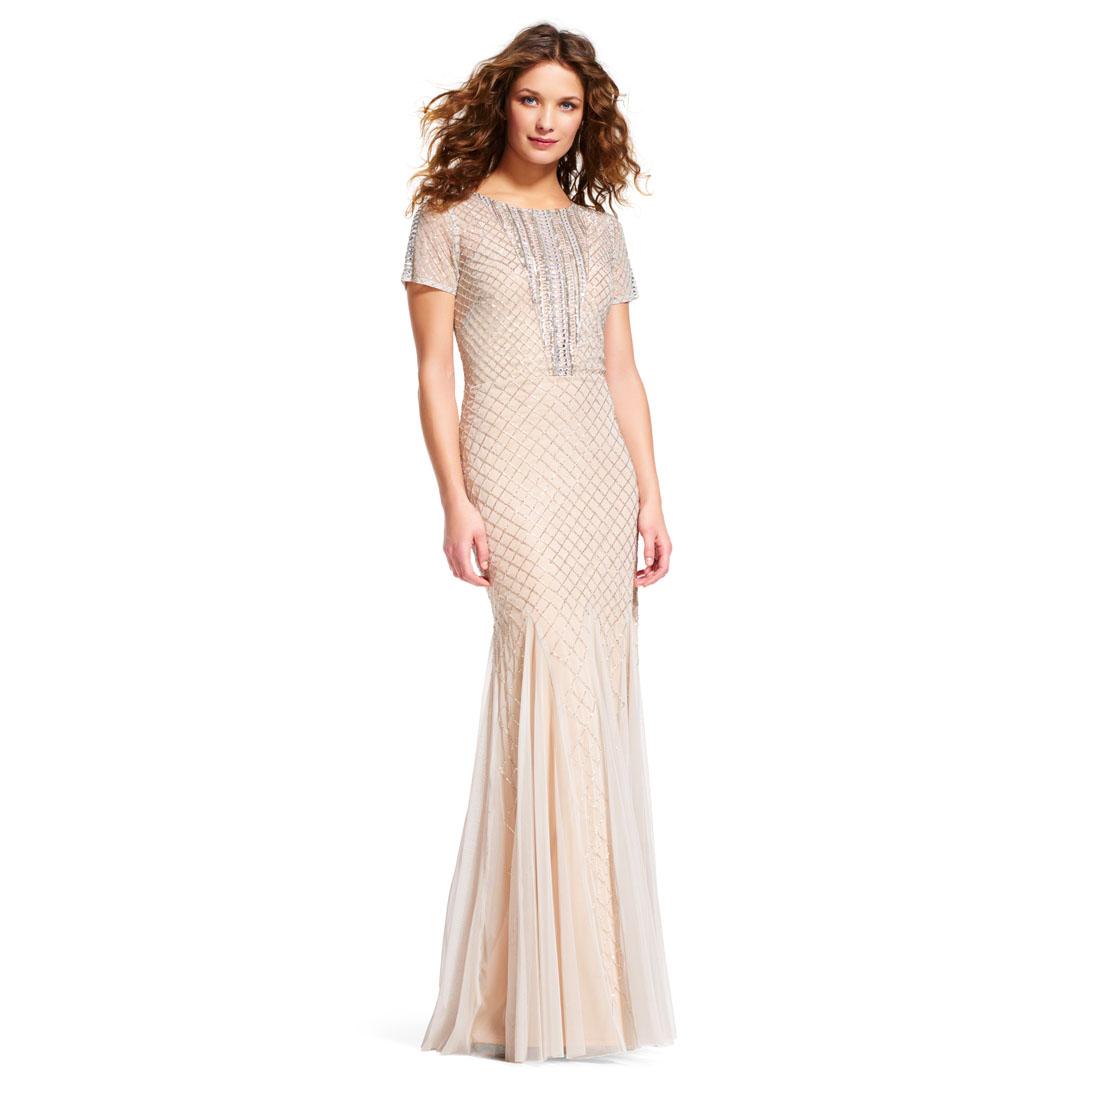 Adrianna Papell Short Sleeve Mermaid Dress with Beaded Neckline | eBay